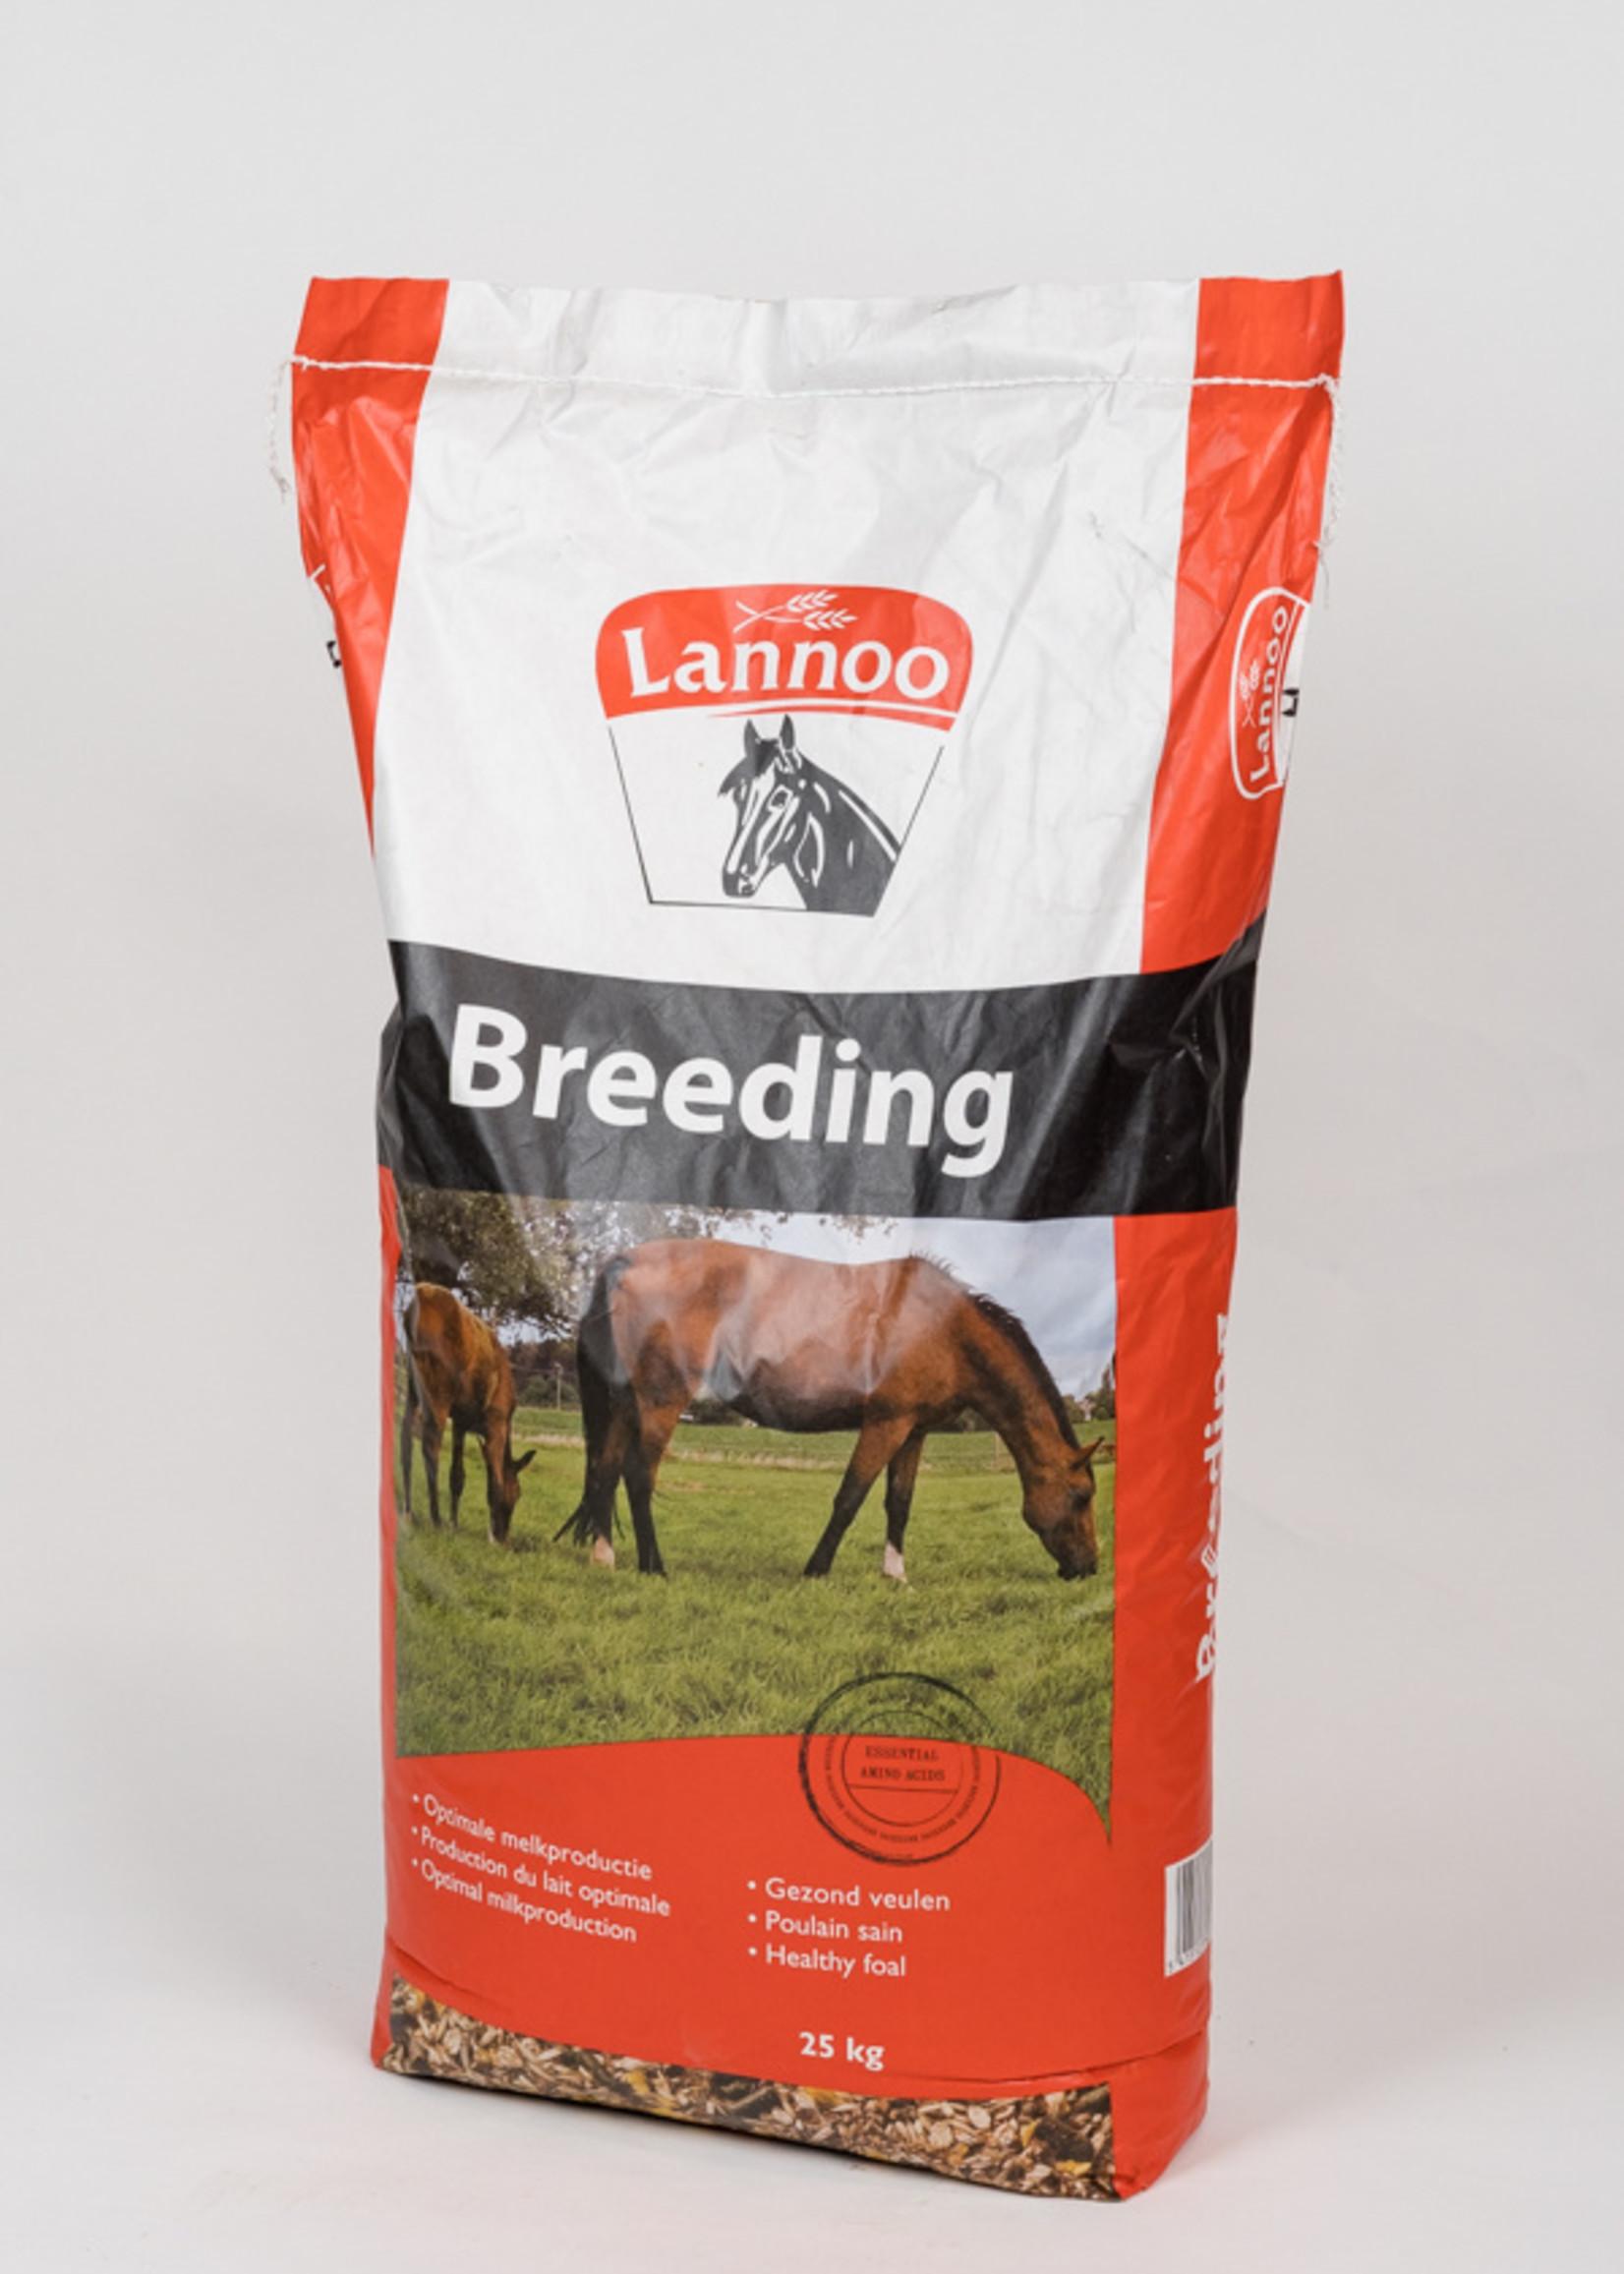 Lannoo Lannoo Breeding 25kg